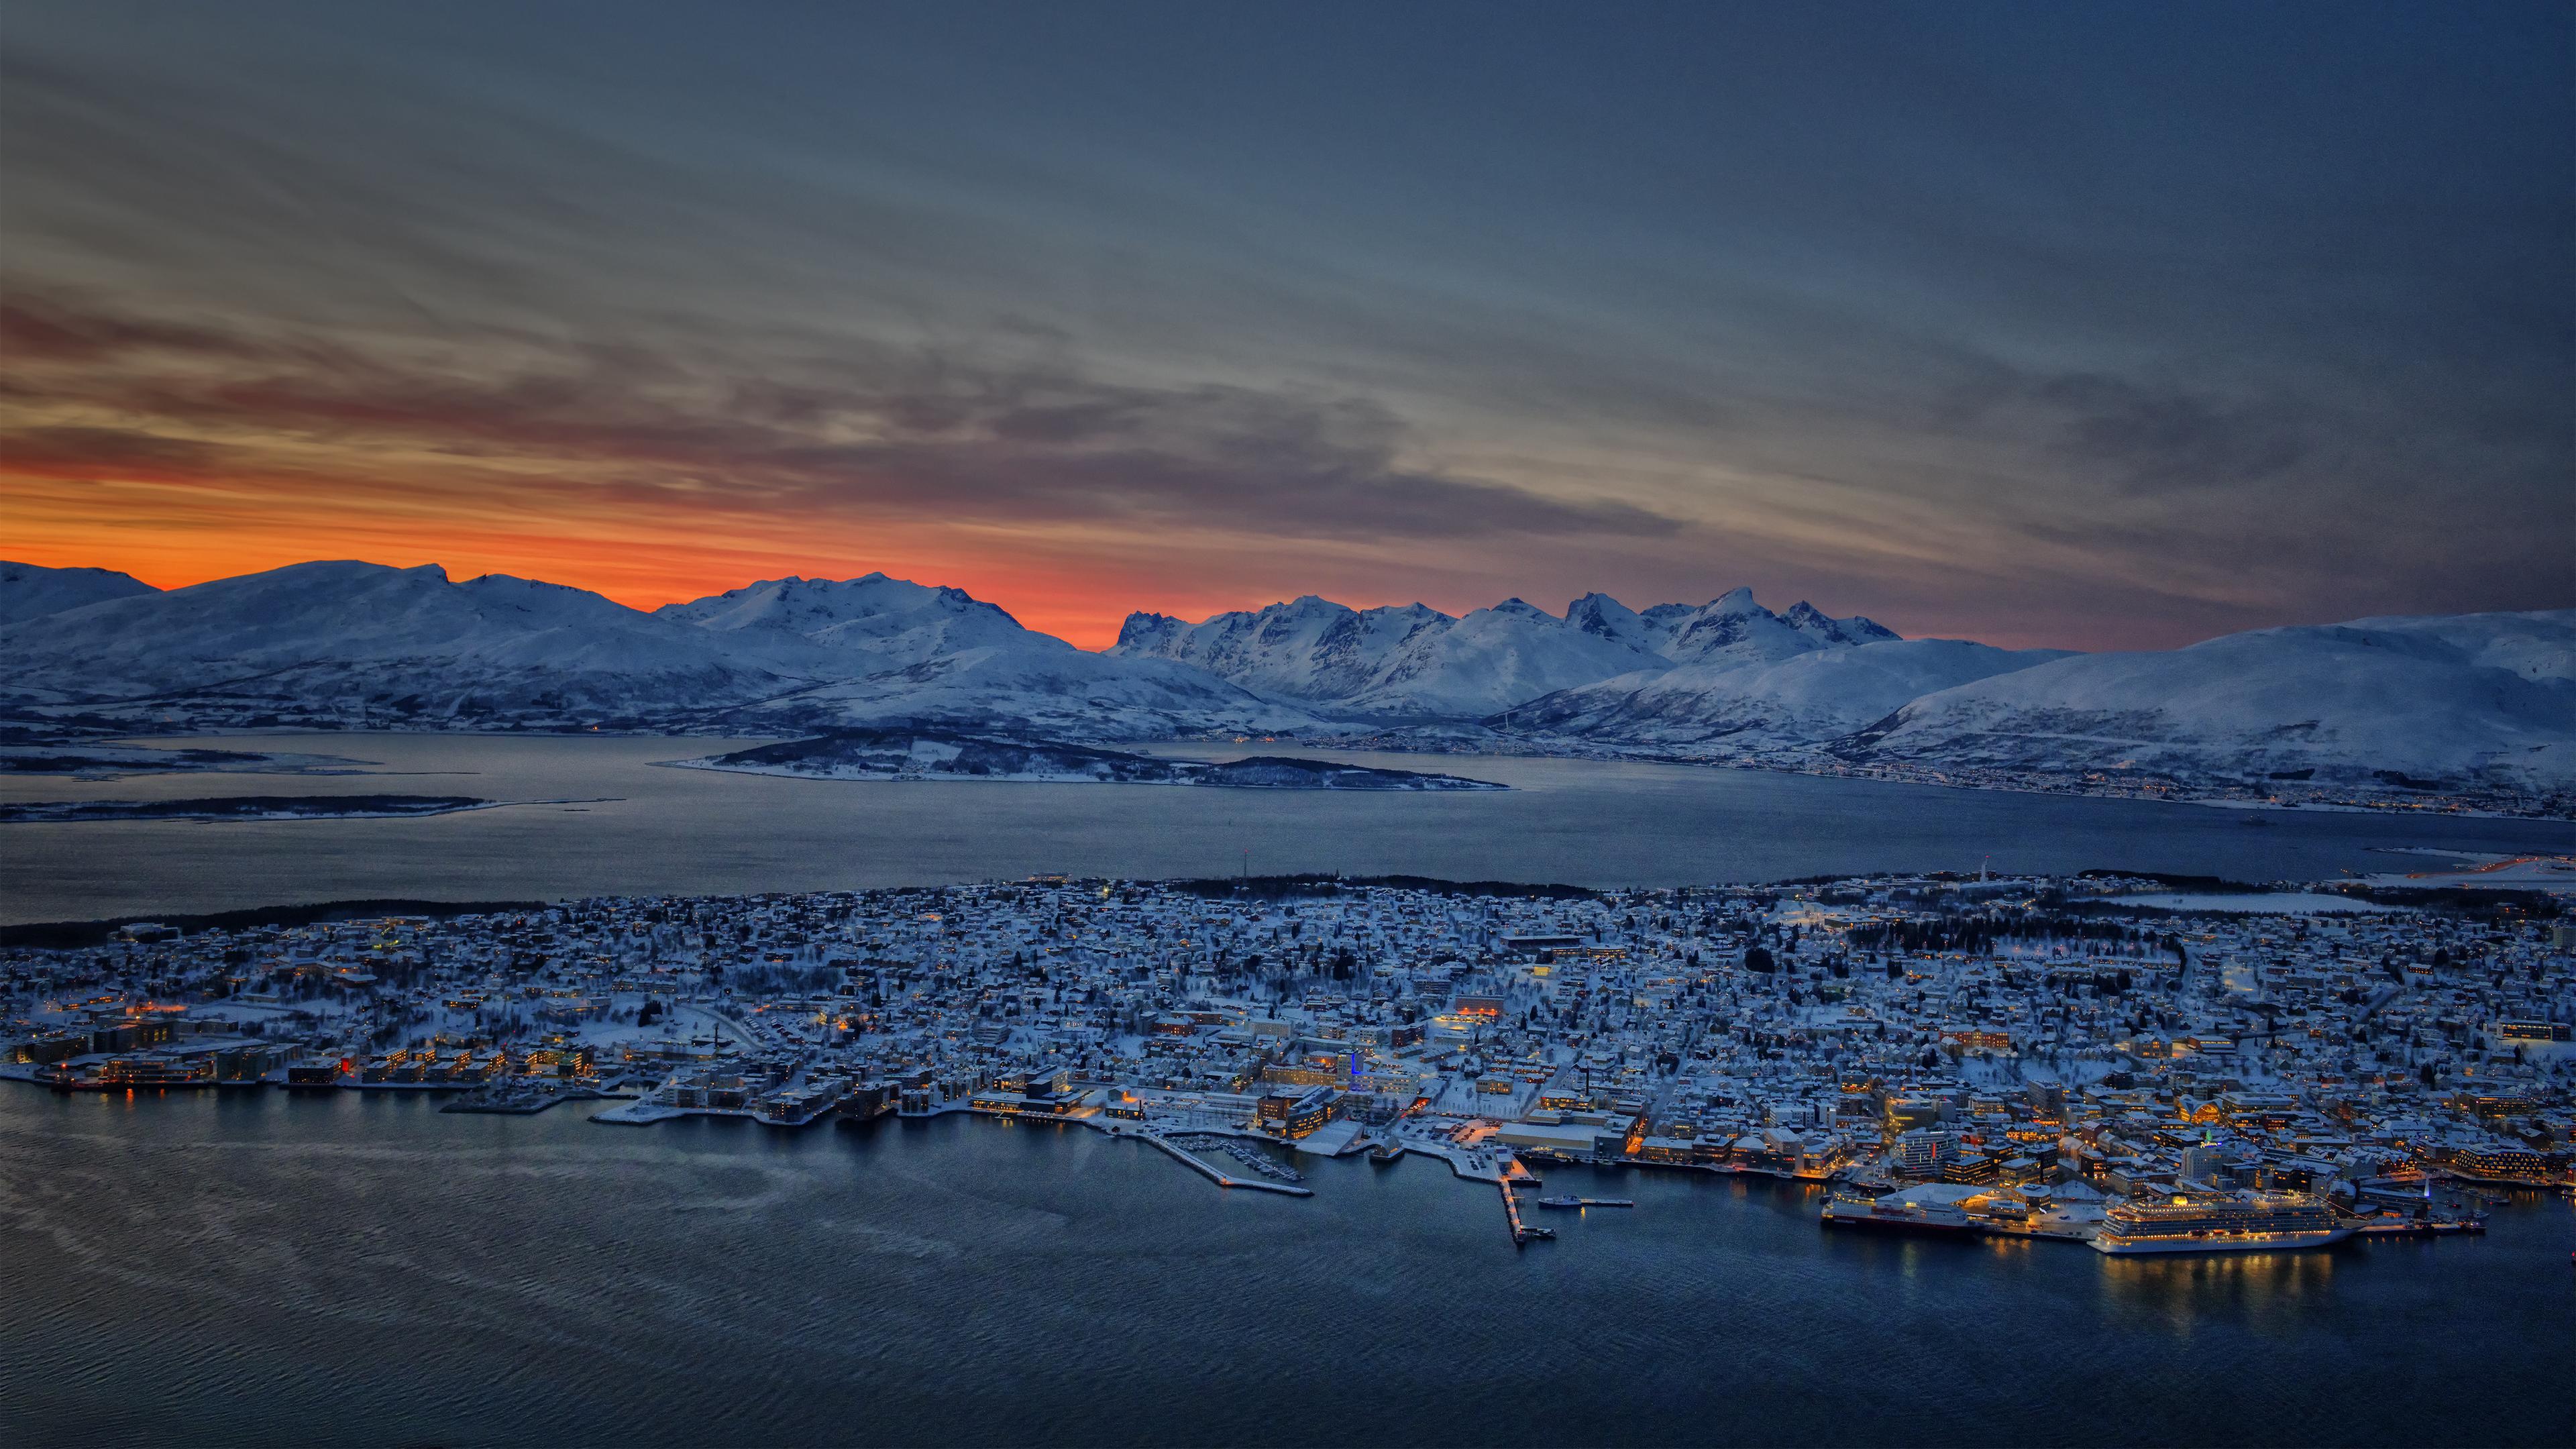 Sunset on Tromso